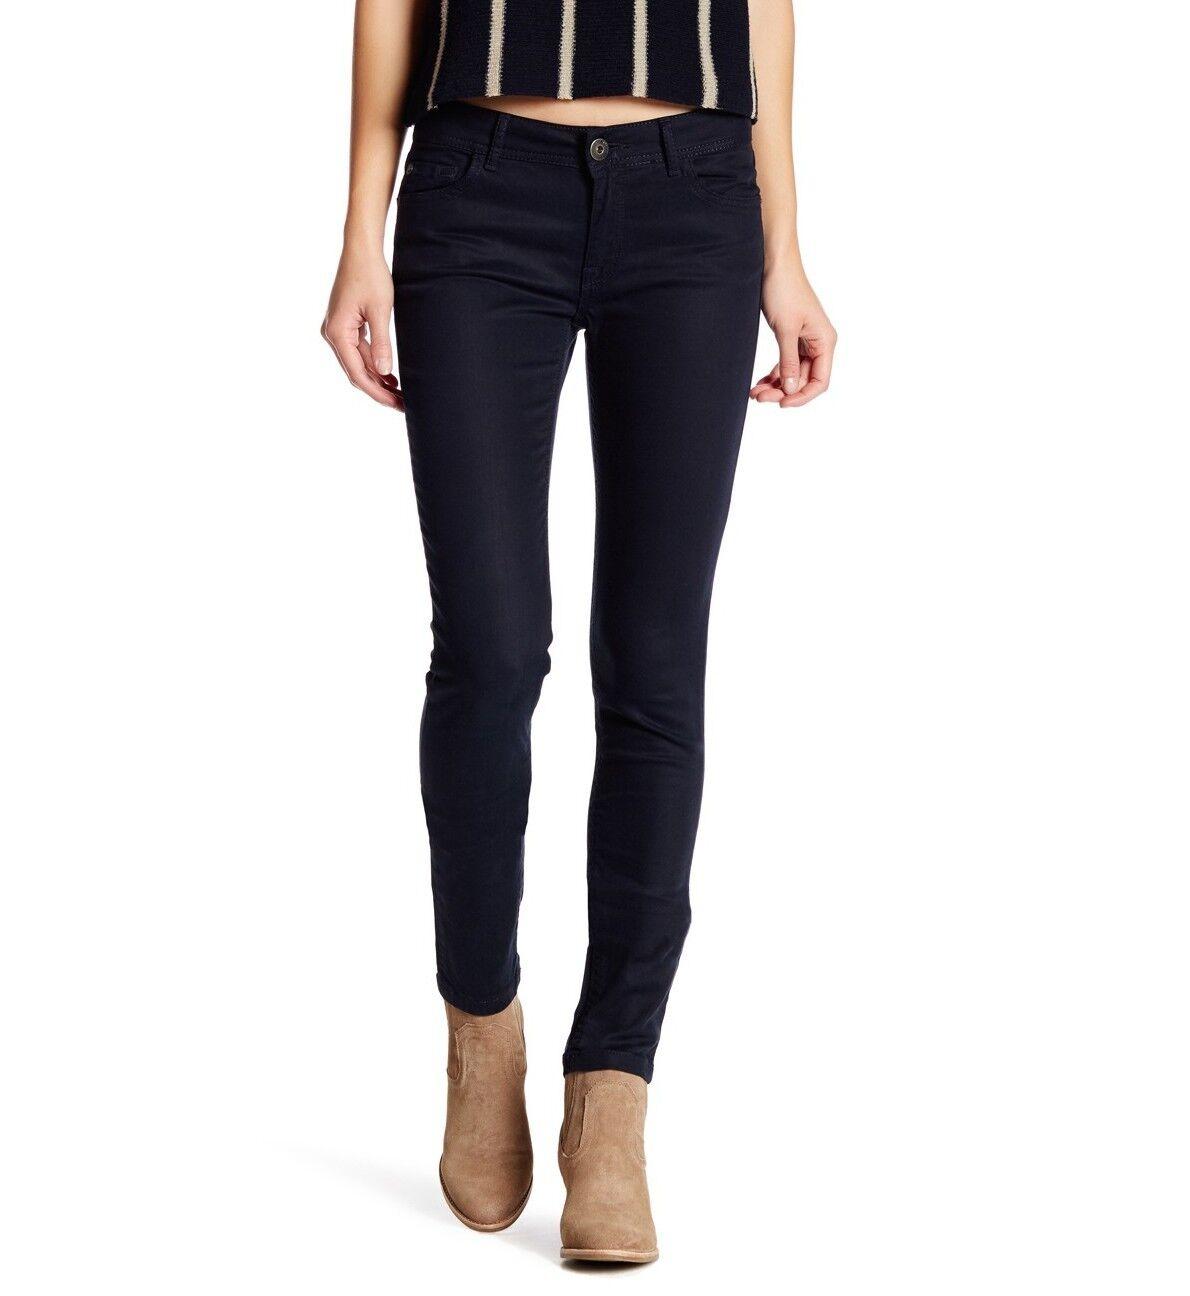 DL1961 Women's 9000 Amanda Skinny Jean Sizes 24 25 26 27 30 MSRP  168 NWT New